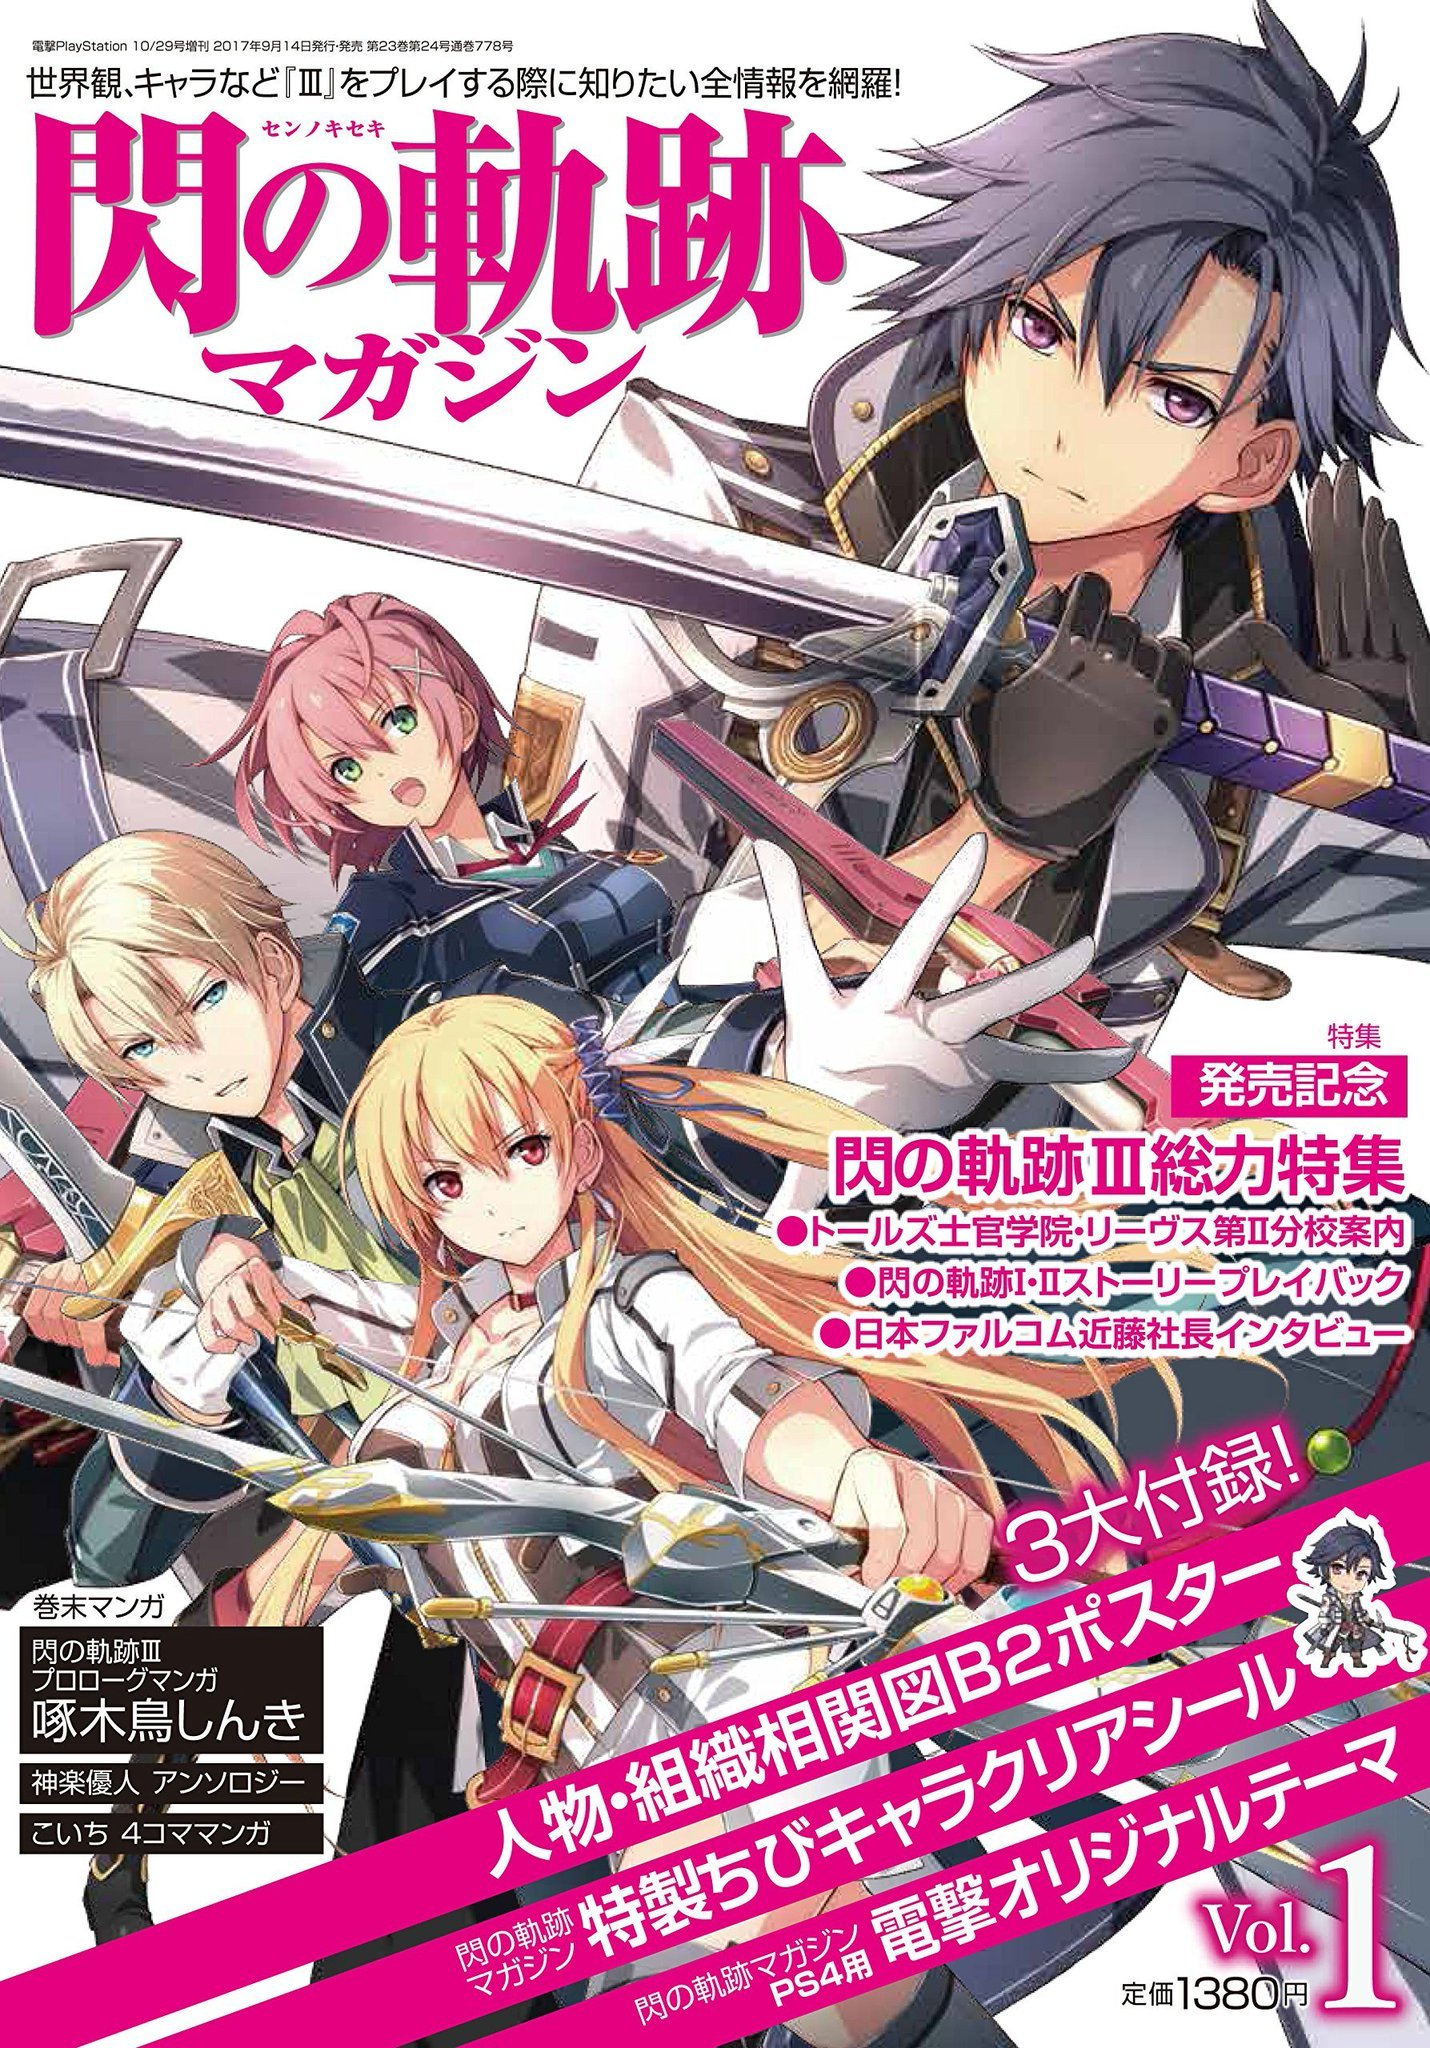 Sen no Kiseki Magazine Vol. 01 (October 29, 2017)